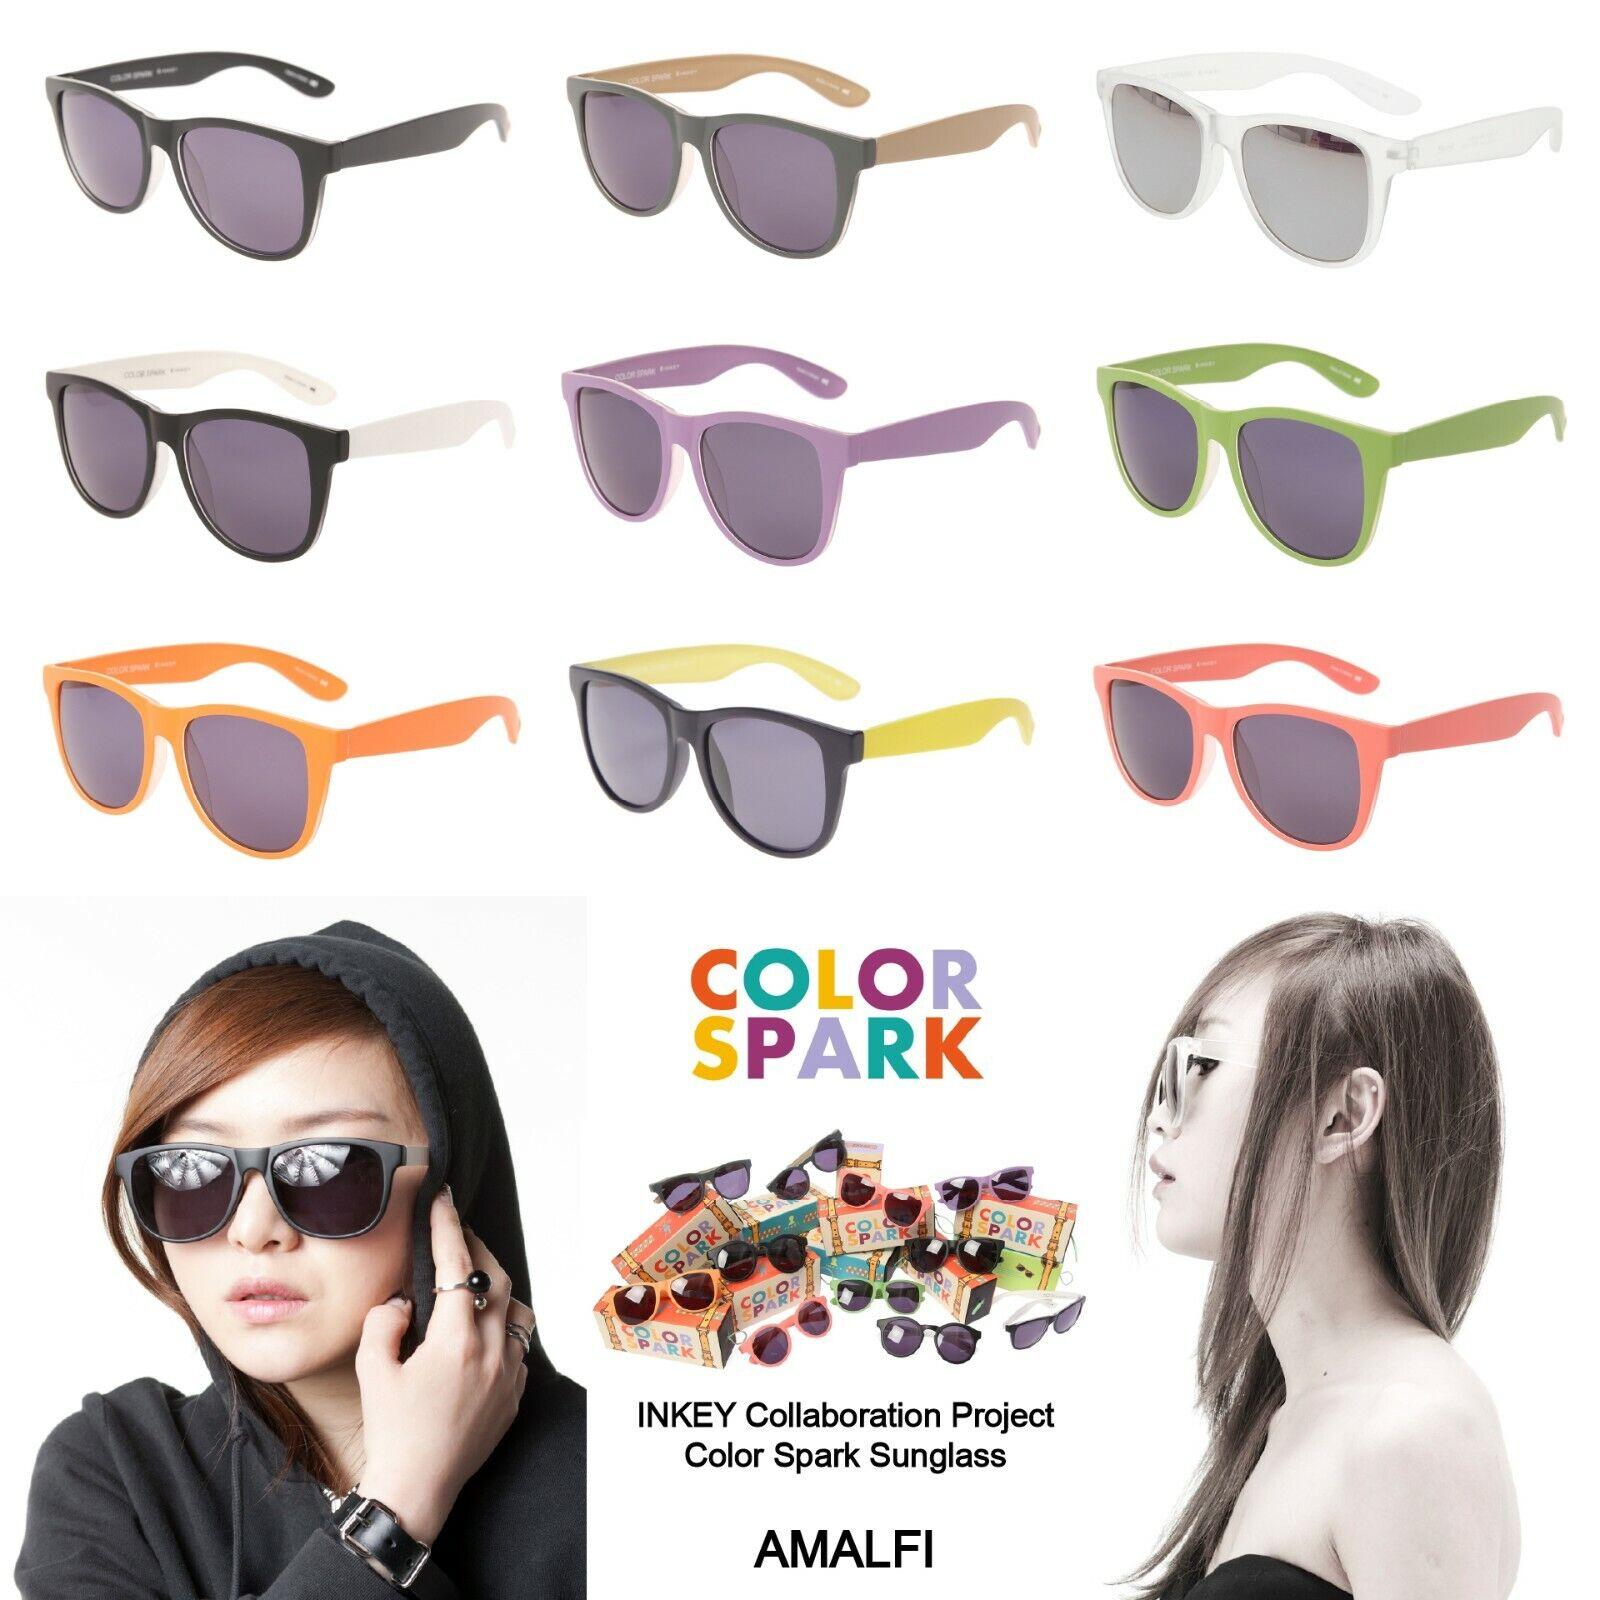 INKEY COLOR SPARK Amalfi Sunglasses Trendy Fashion Eyewear Black Lens Designer